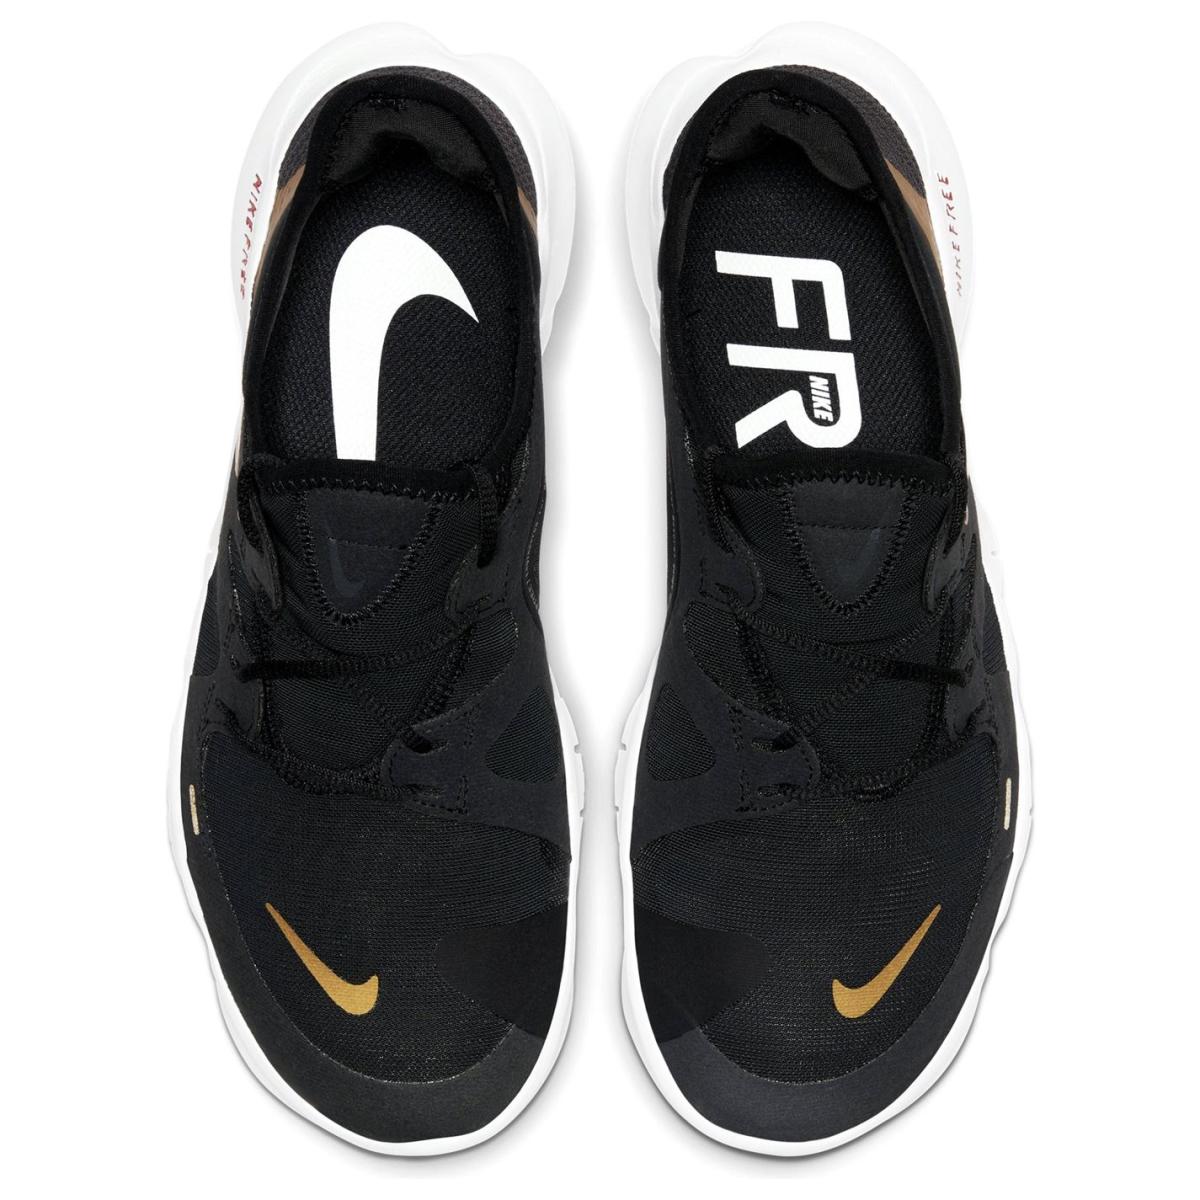 Nike-Free-Run-5-0-Turnschuhe-Damen-Sneaker-Sportschuhe-Laufschuhe-4923 Indexbild 6